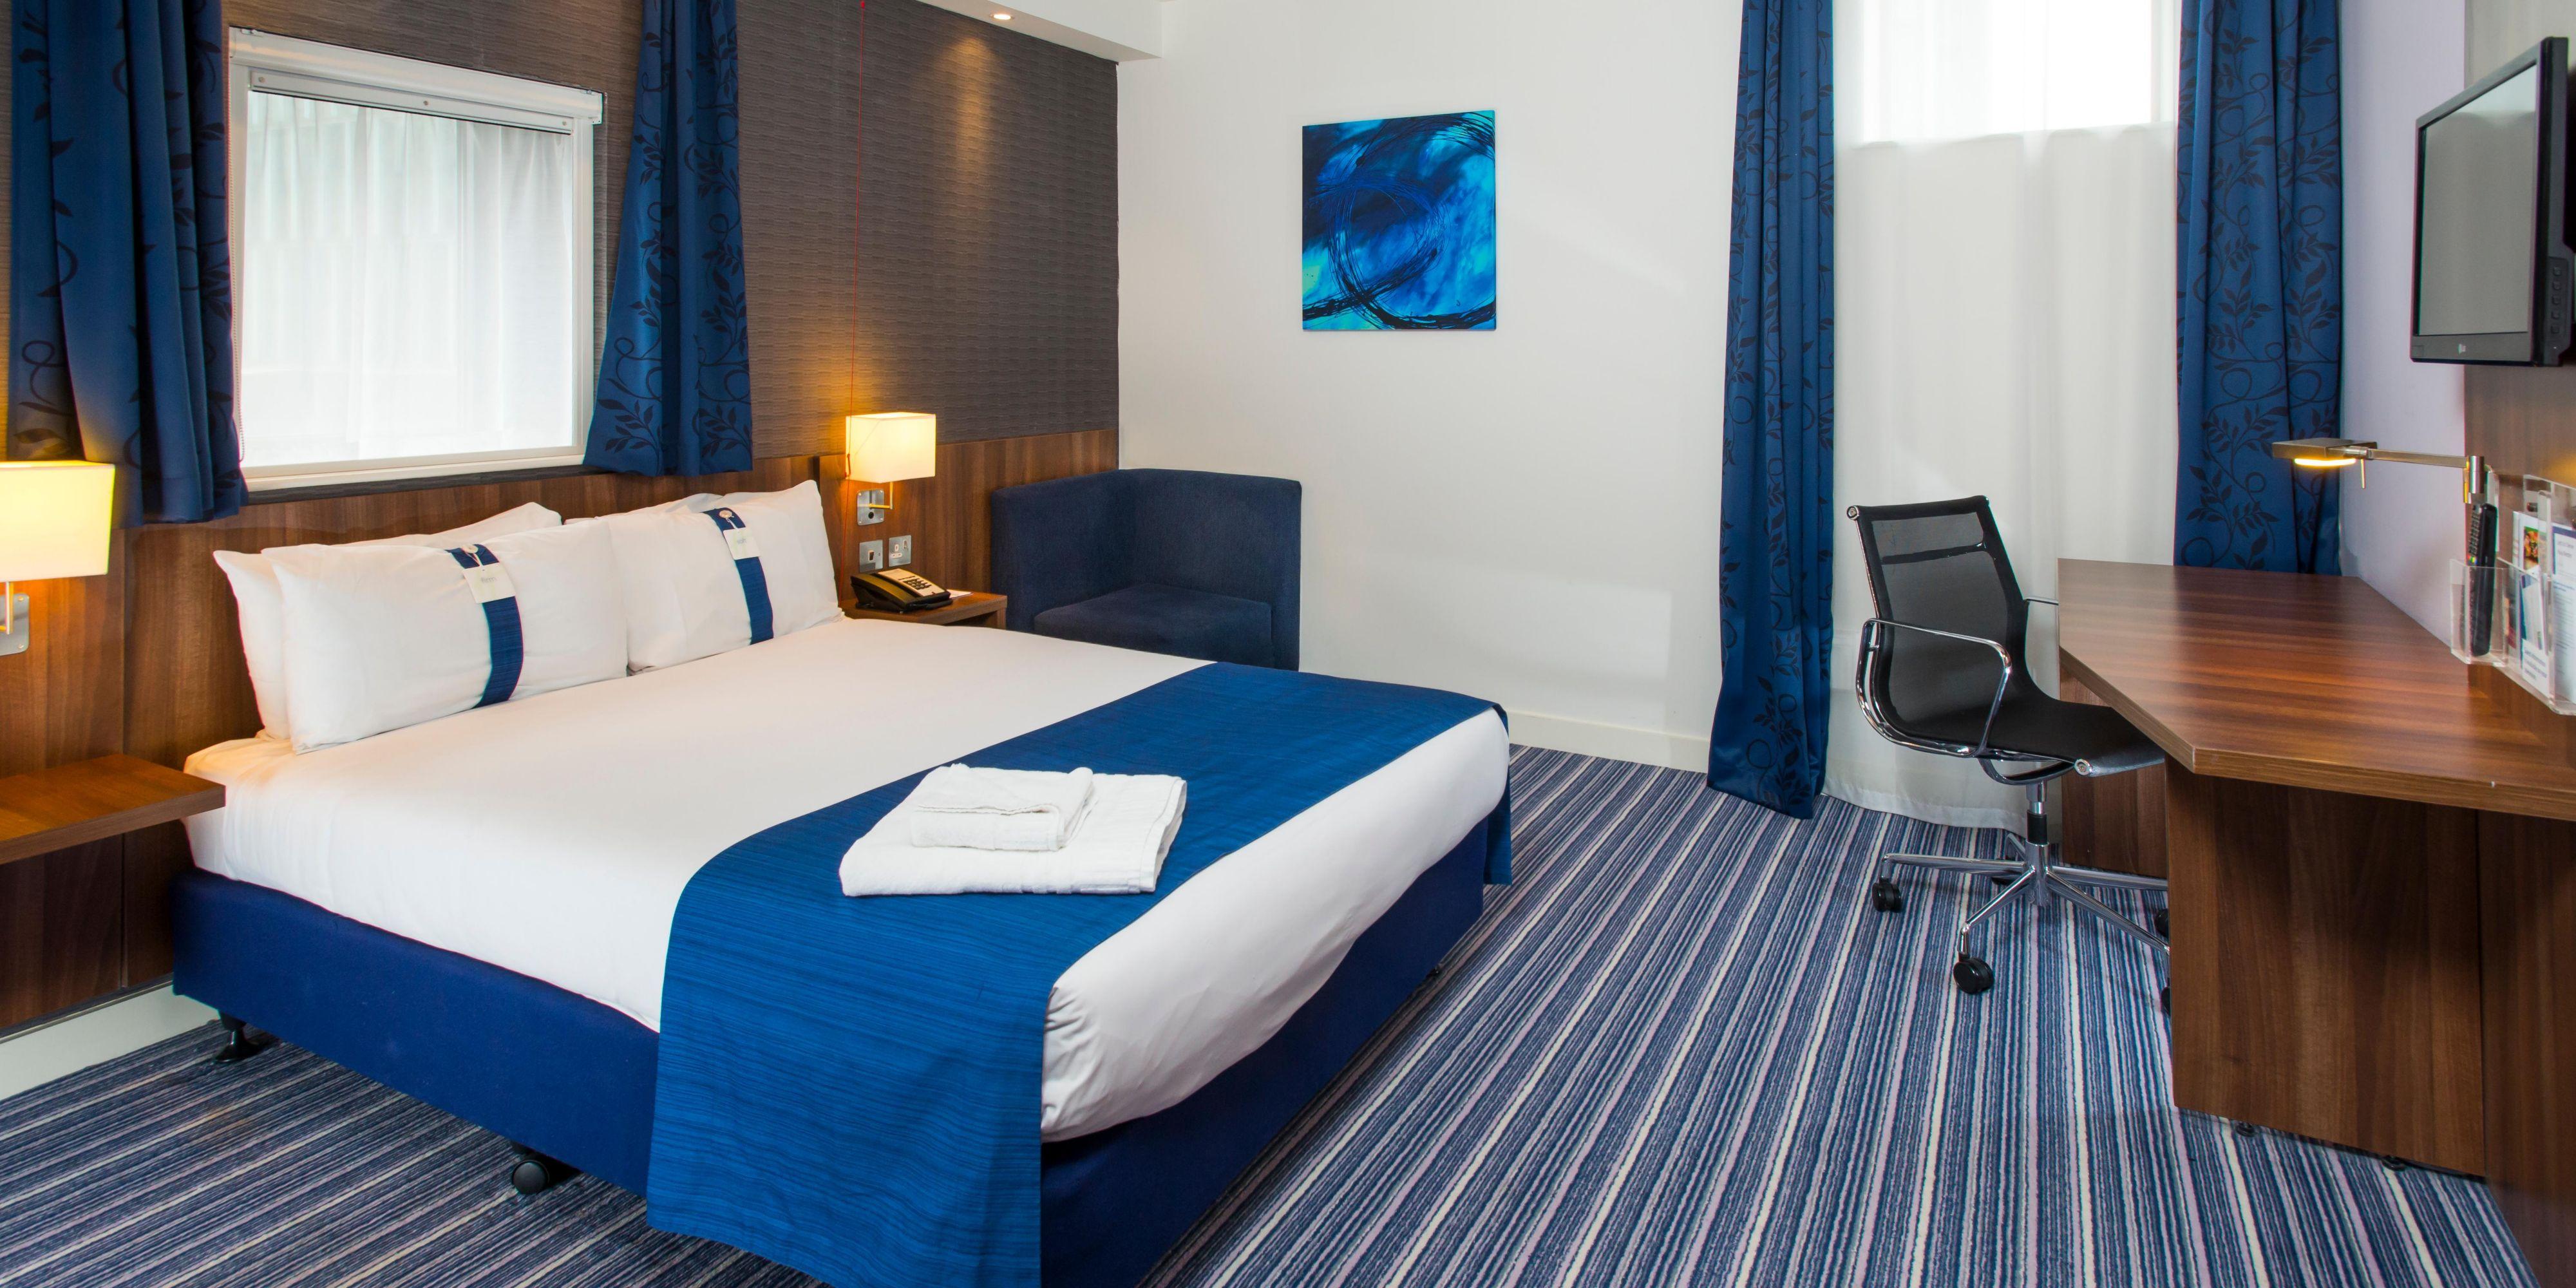 Holiday Inn Express Birmingham 3714859138 2x1